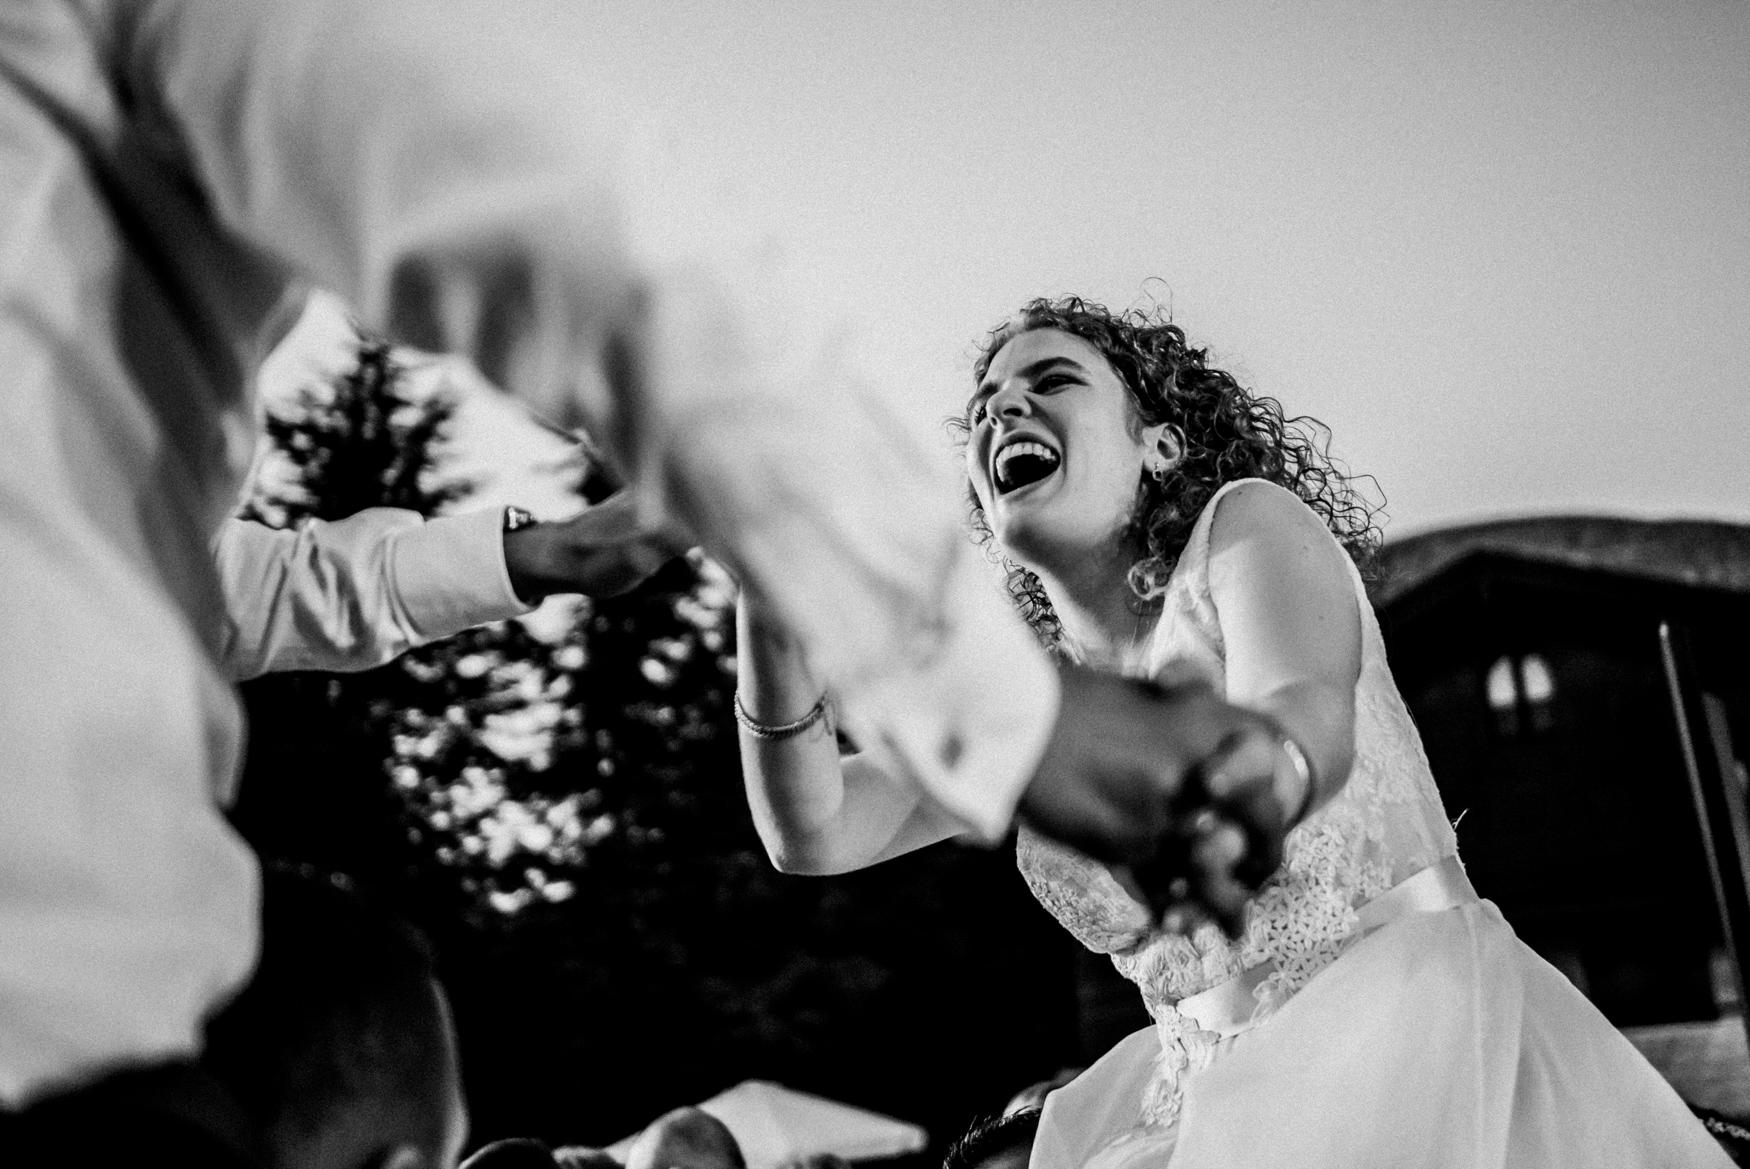 LR5 beirut lebanon mzaar intercontinental wedding photographer 022.jpg